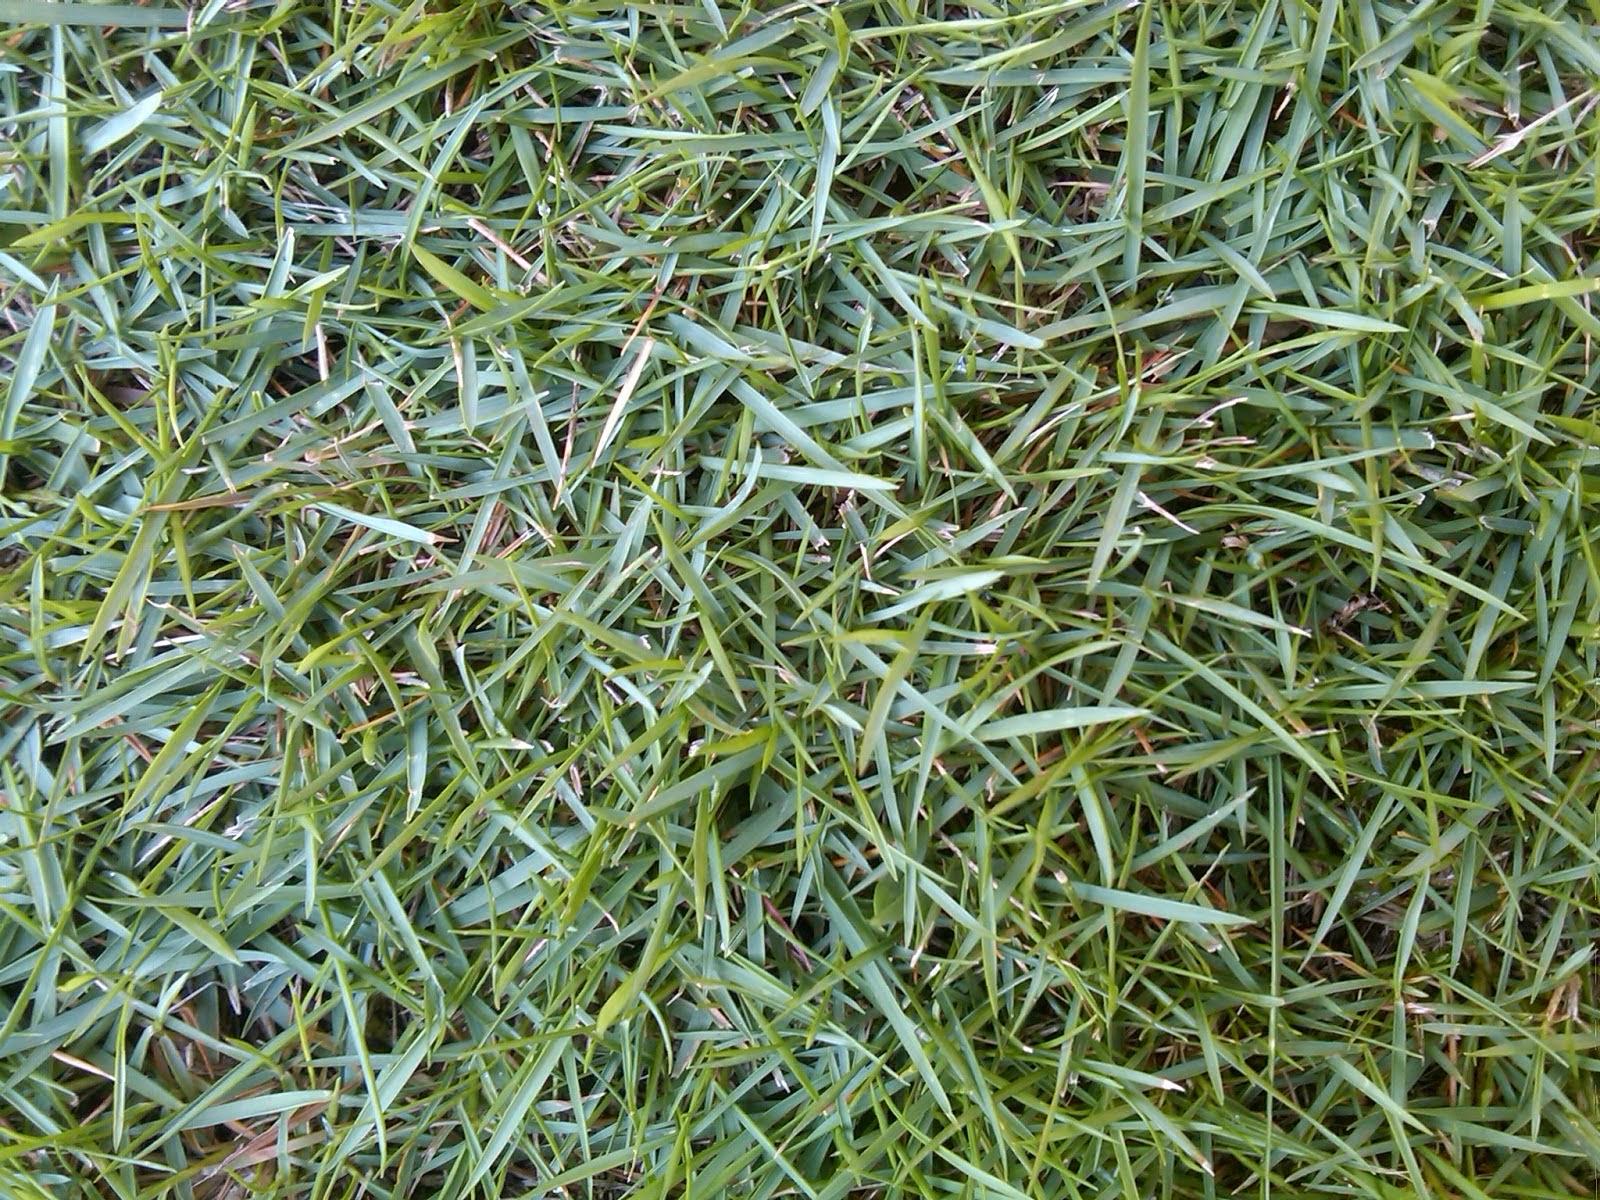 Jual Rumput Swiss | Tukang Rumput Taman | Jasa Pasang Rumput Taman | Jasa Tukang Taman